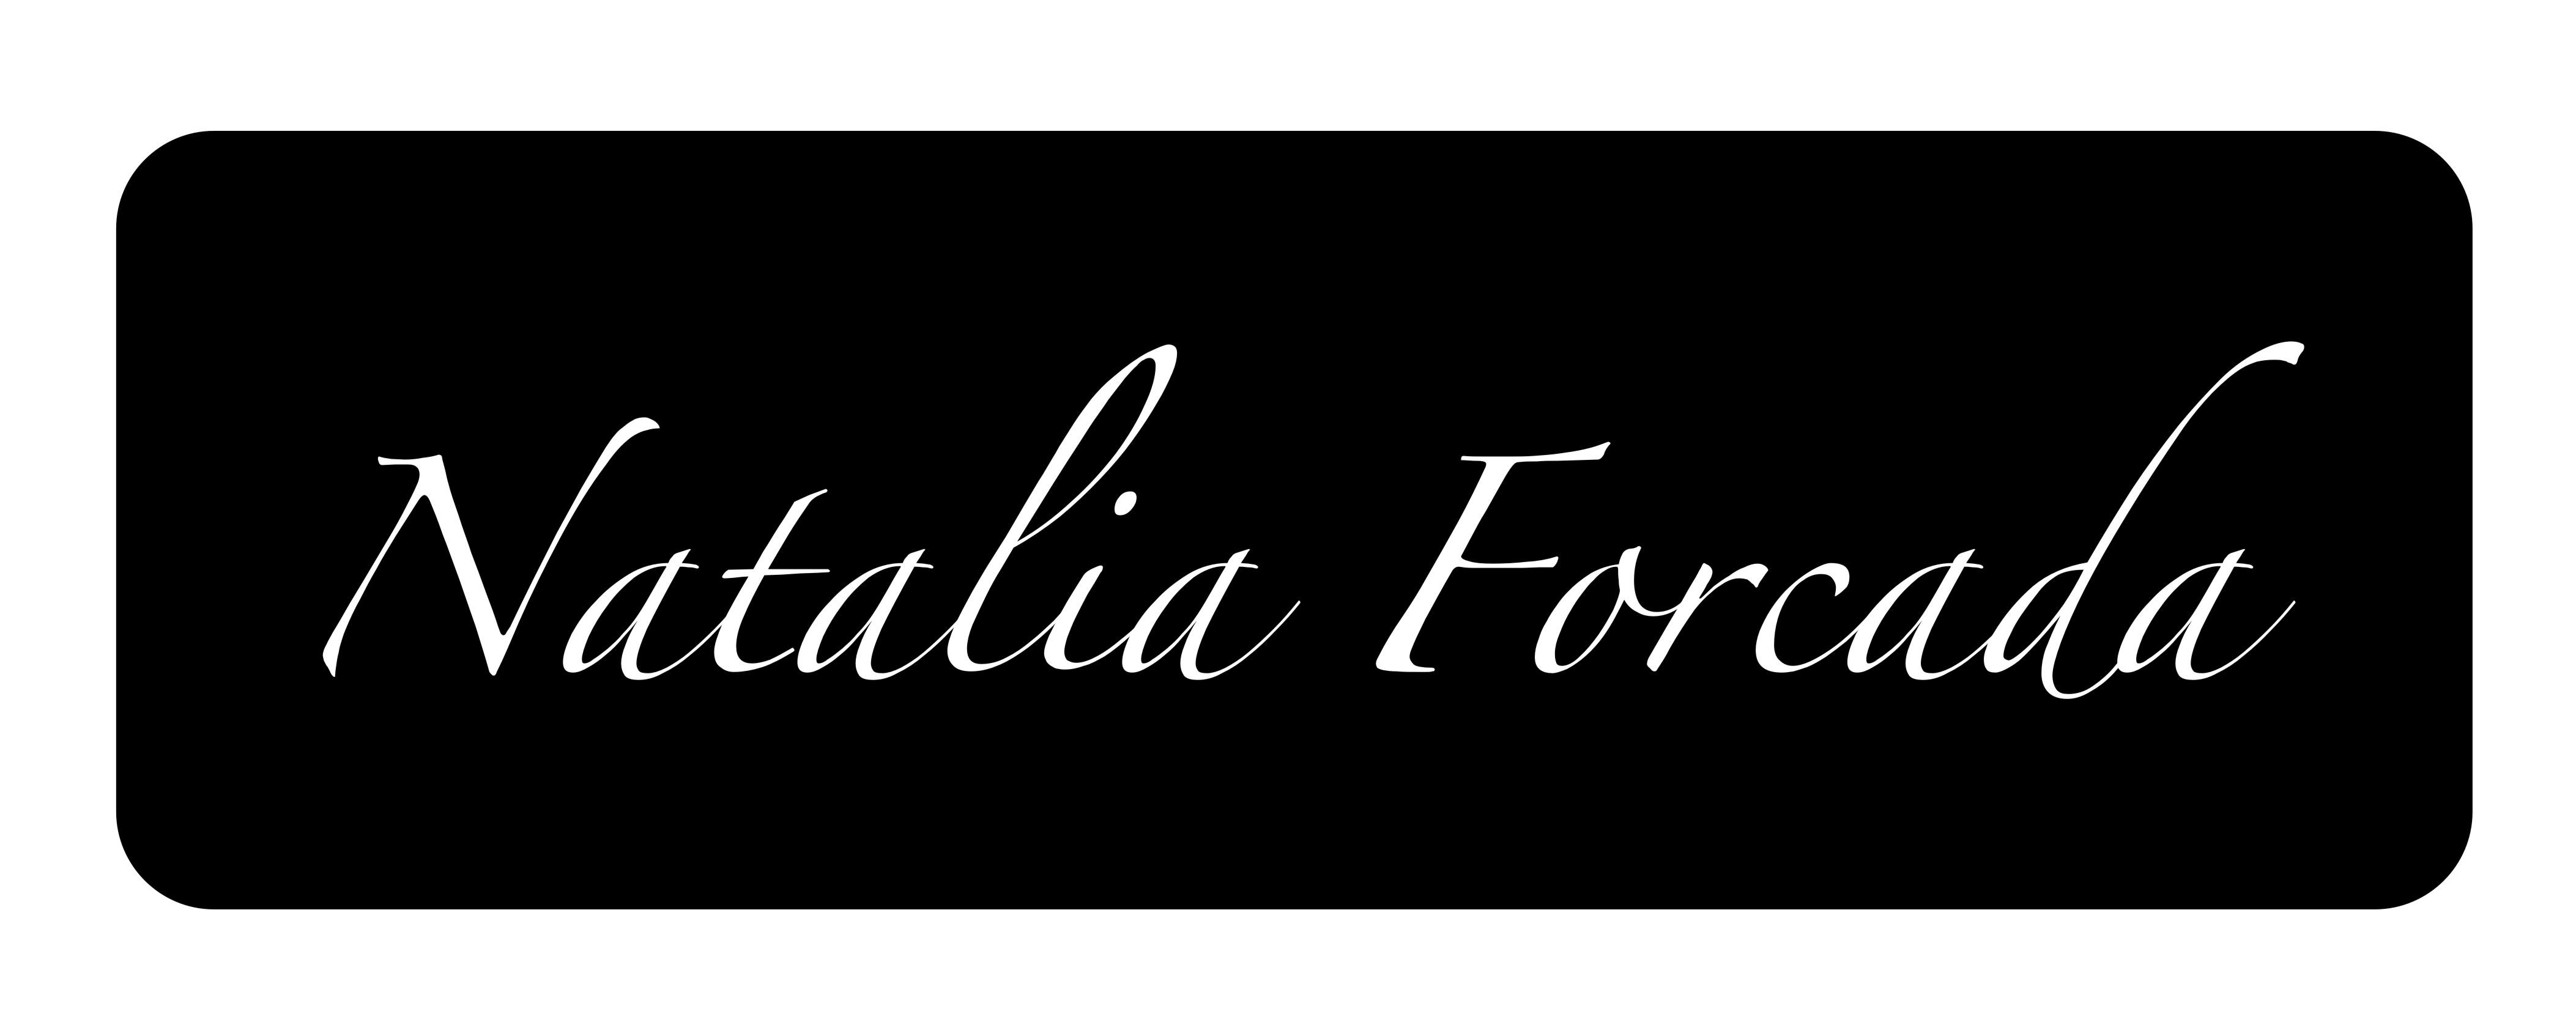 Natalia Forcada's Signature